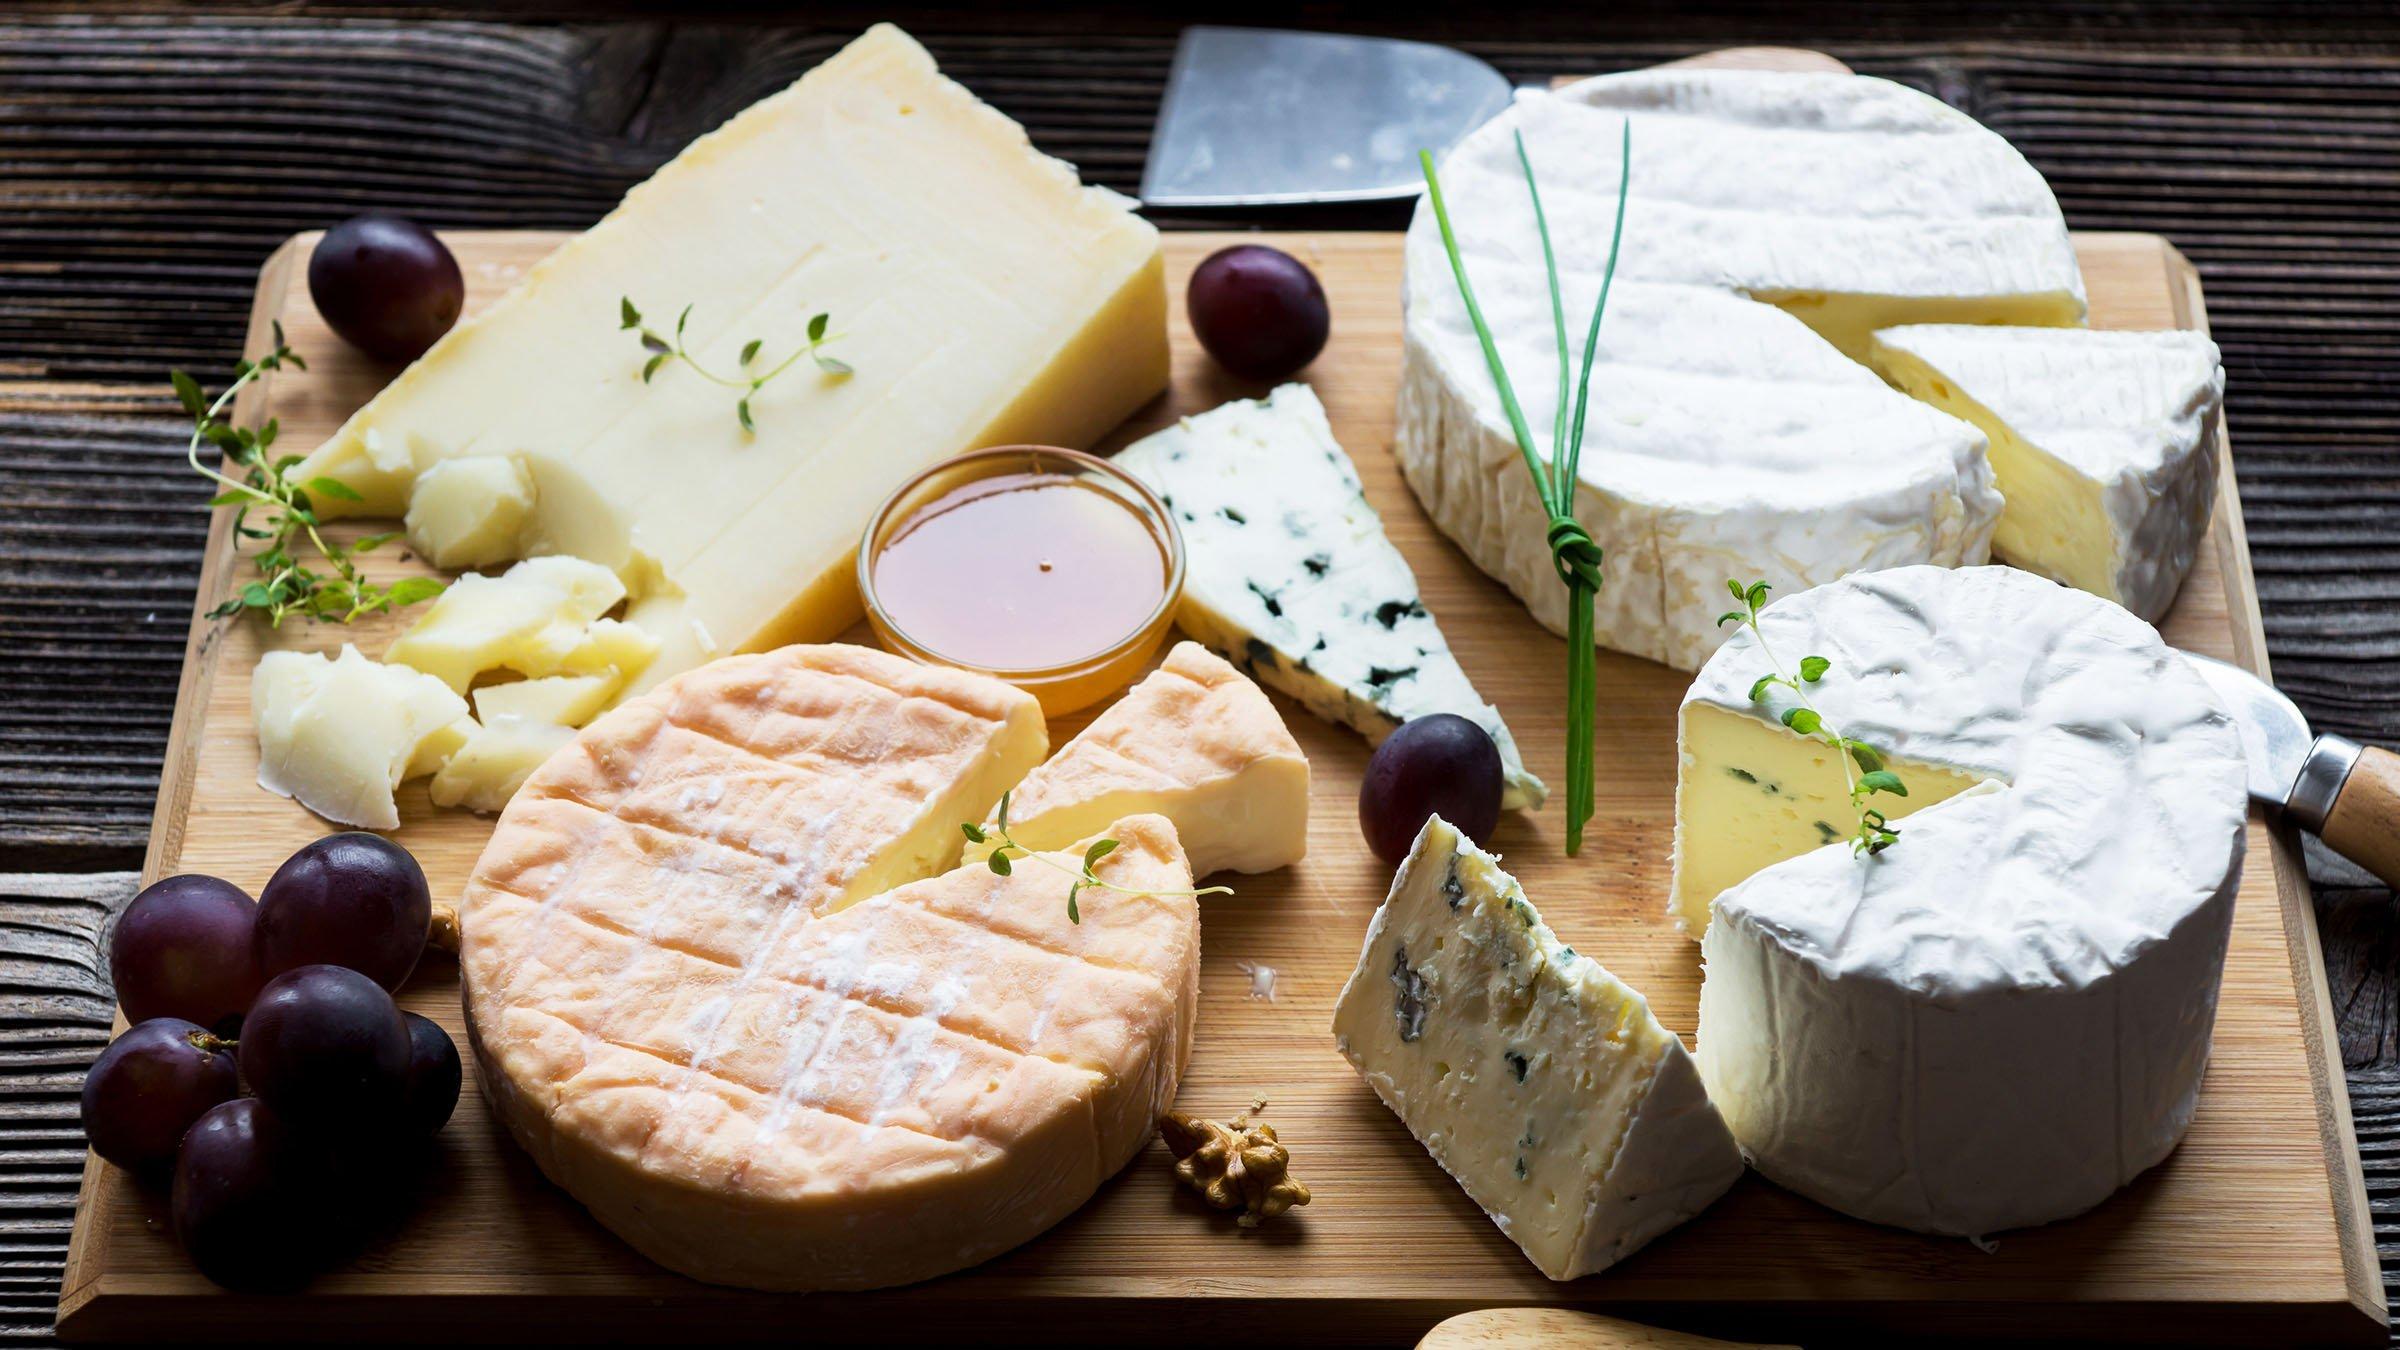 Los mejores quesos franceses for Guisos franceses